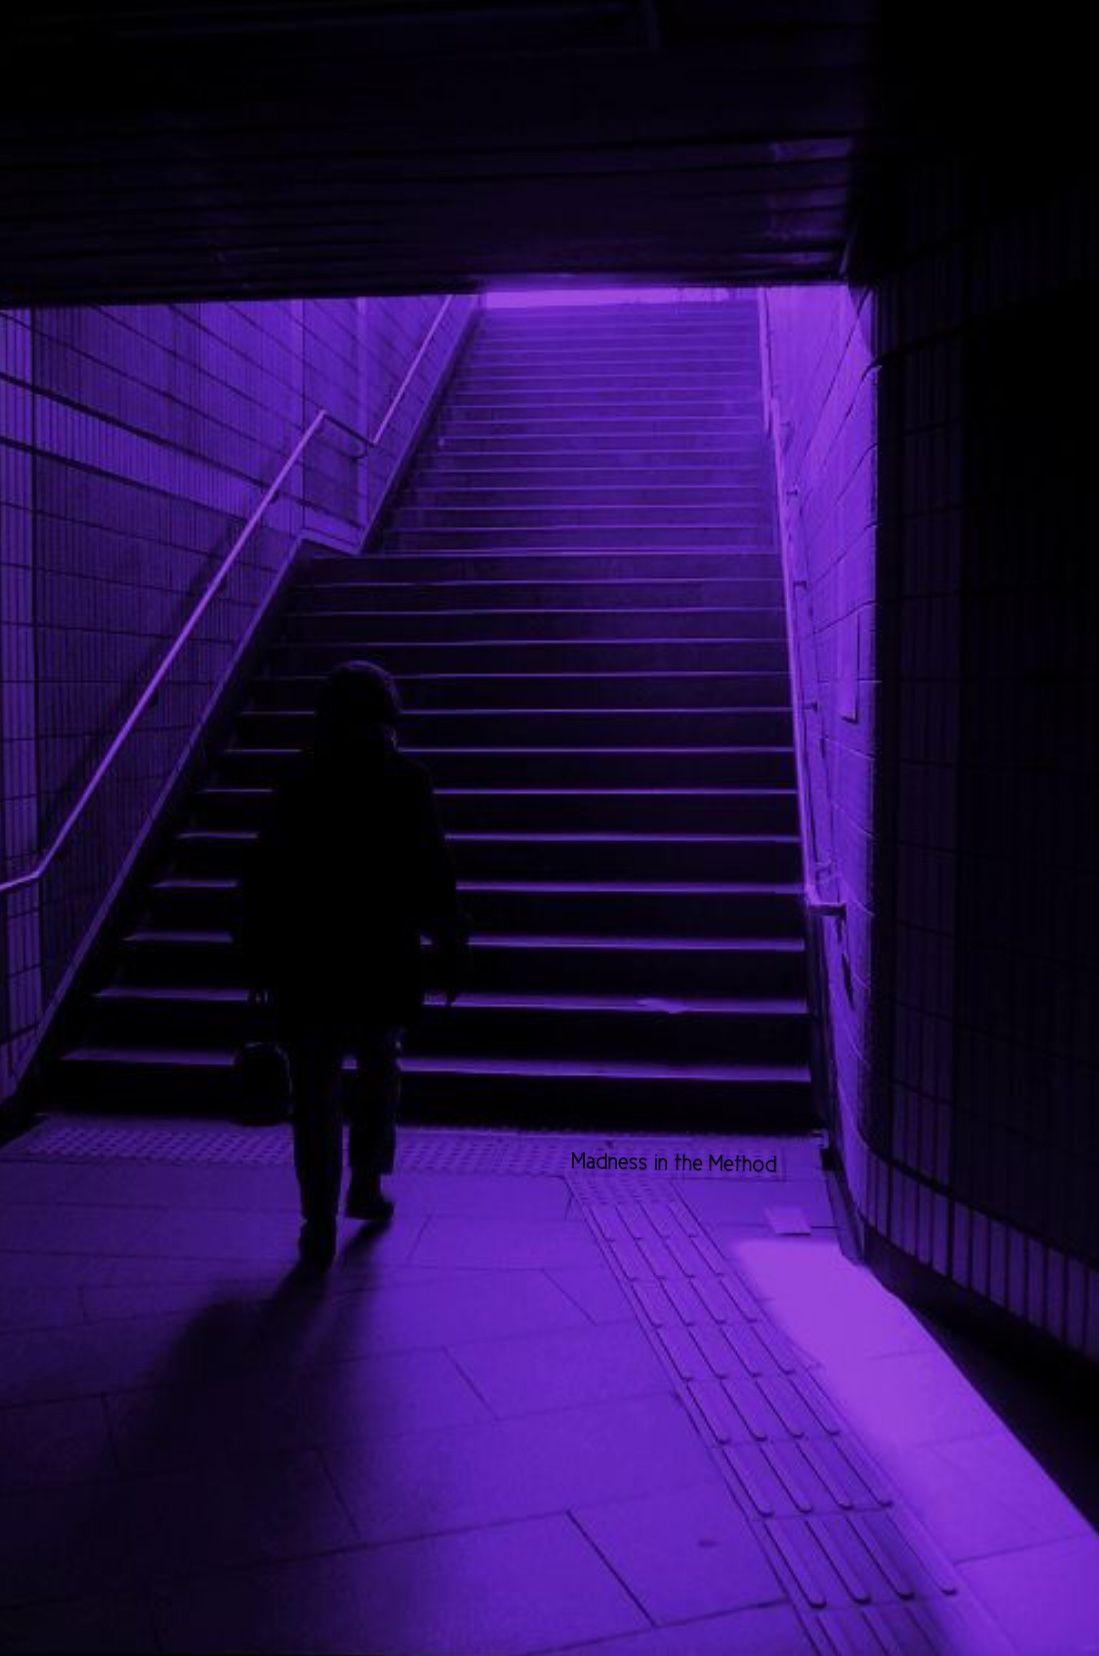 Pin by Yasmin alya on purple Purple aesthetic, Blue